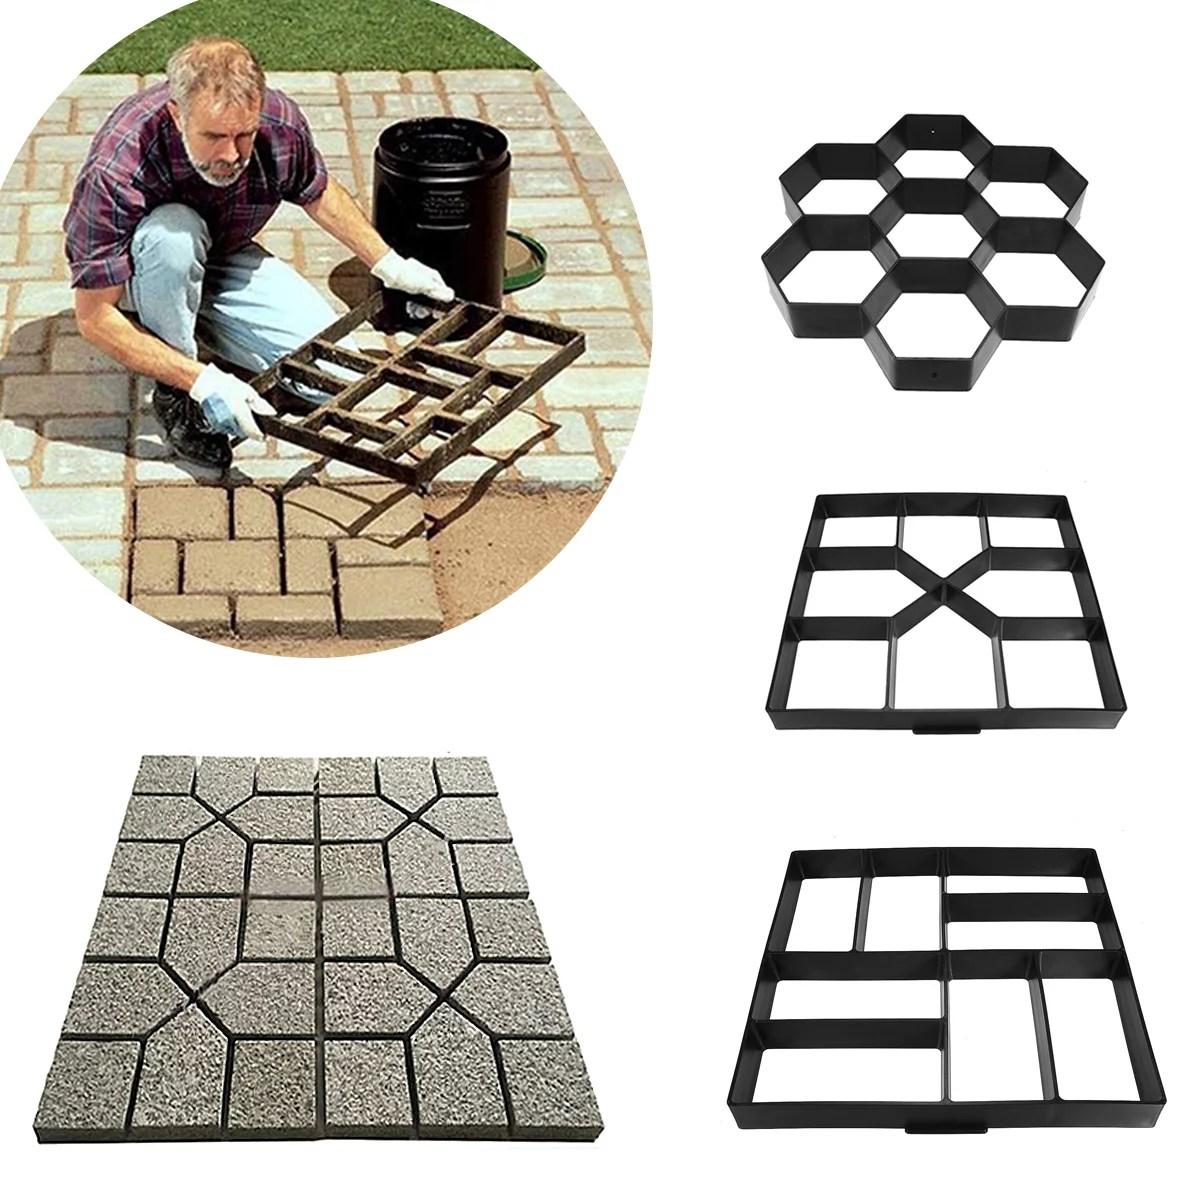 diy path maker mold garden paving mould patio concrete stone lawn walk maker slabs path brick